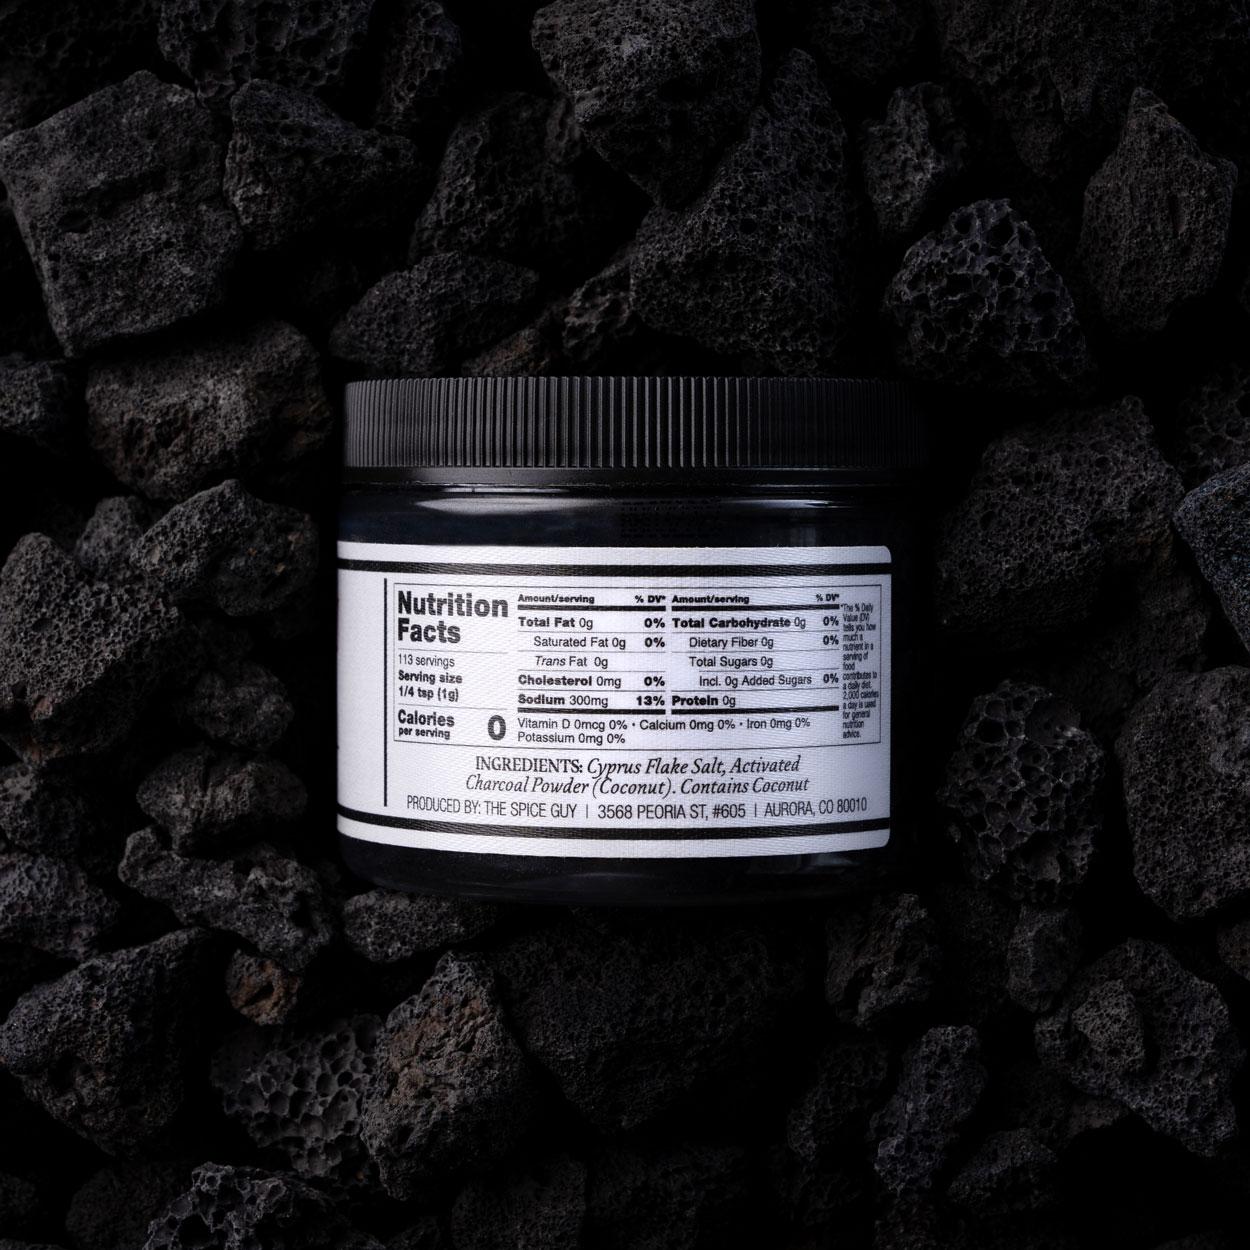 Sumi Shio Wagyu Beef Dry Rub Ingredients Charcoal Coconut Oil & Cypress Salt